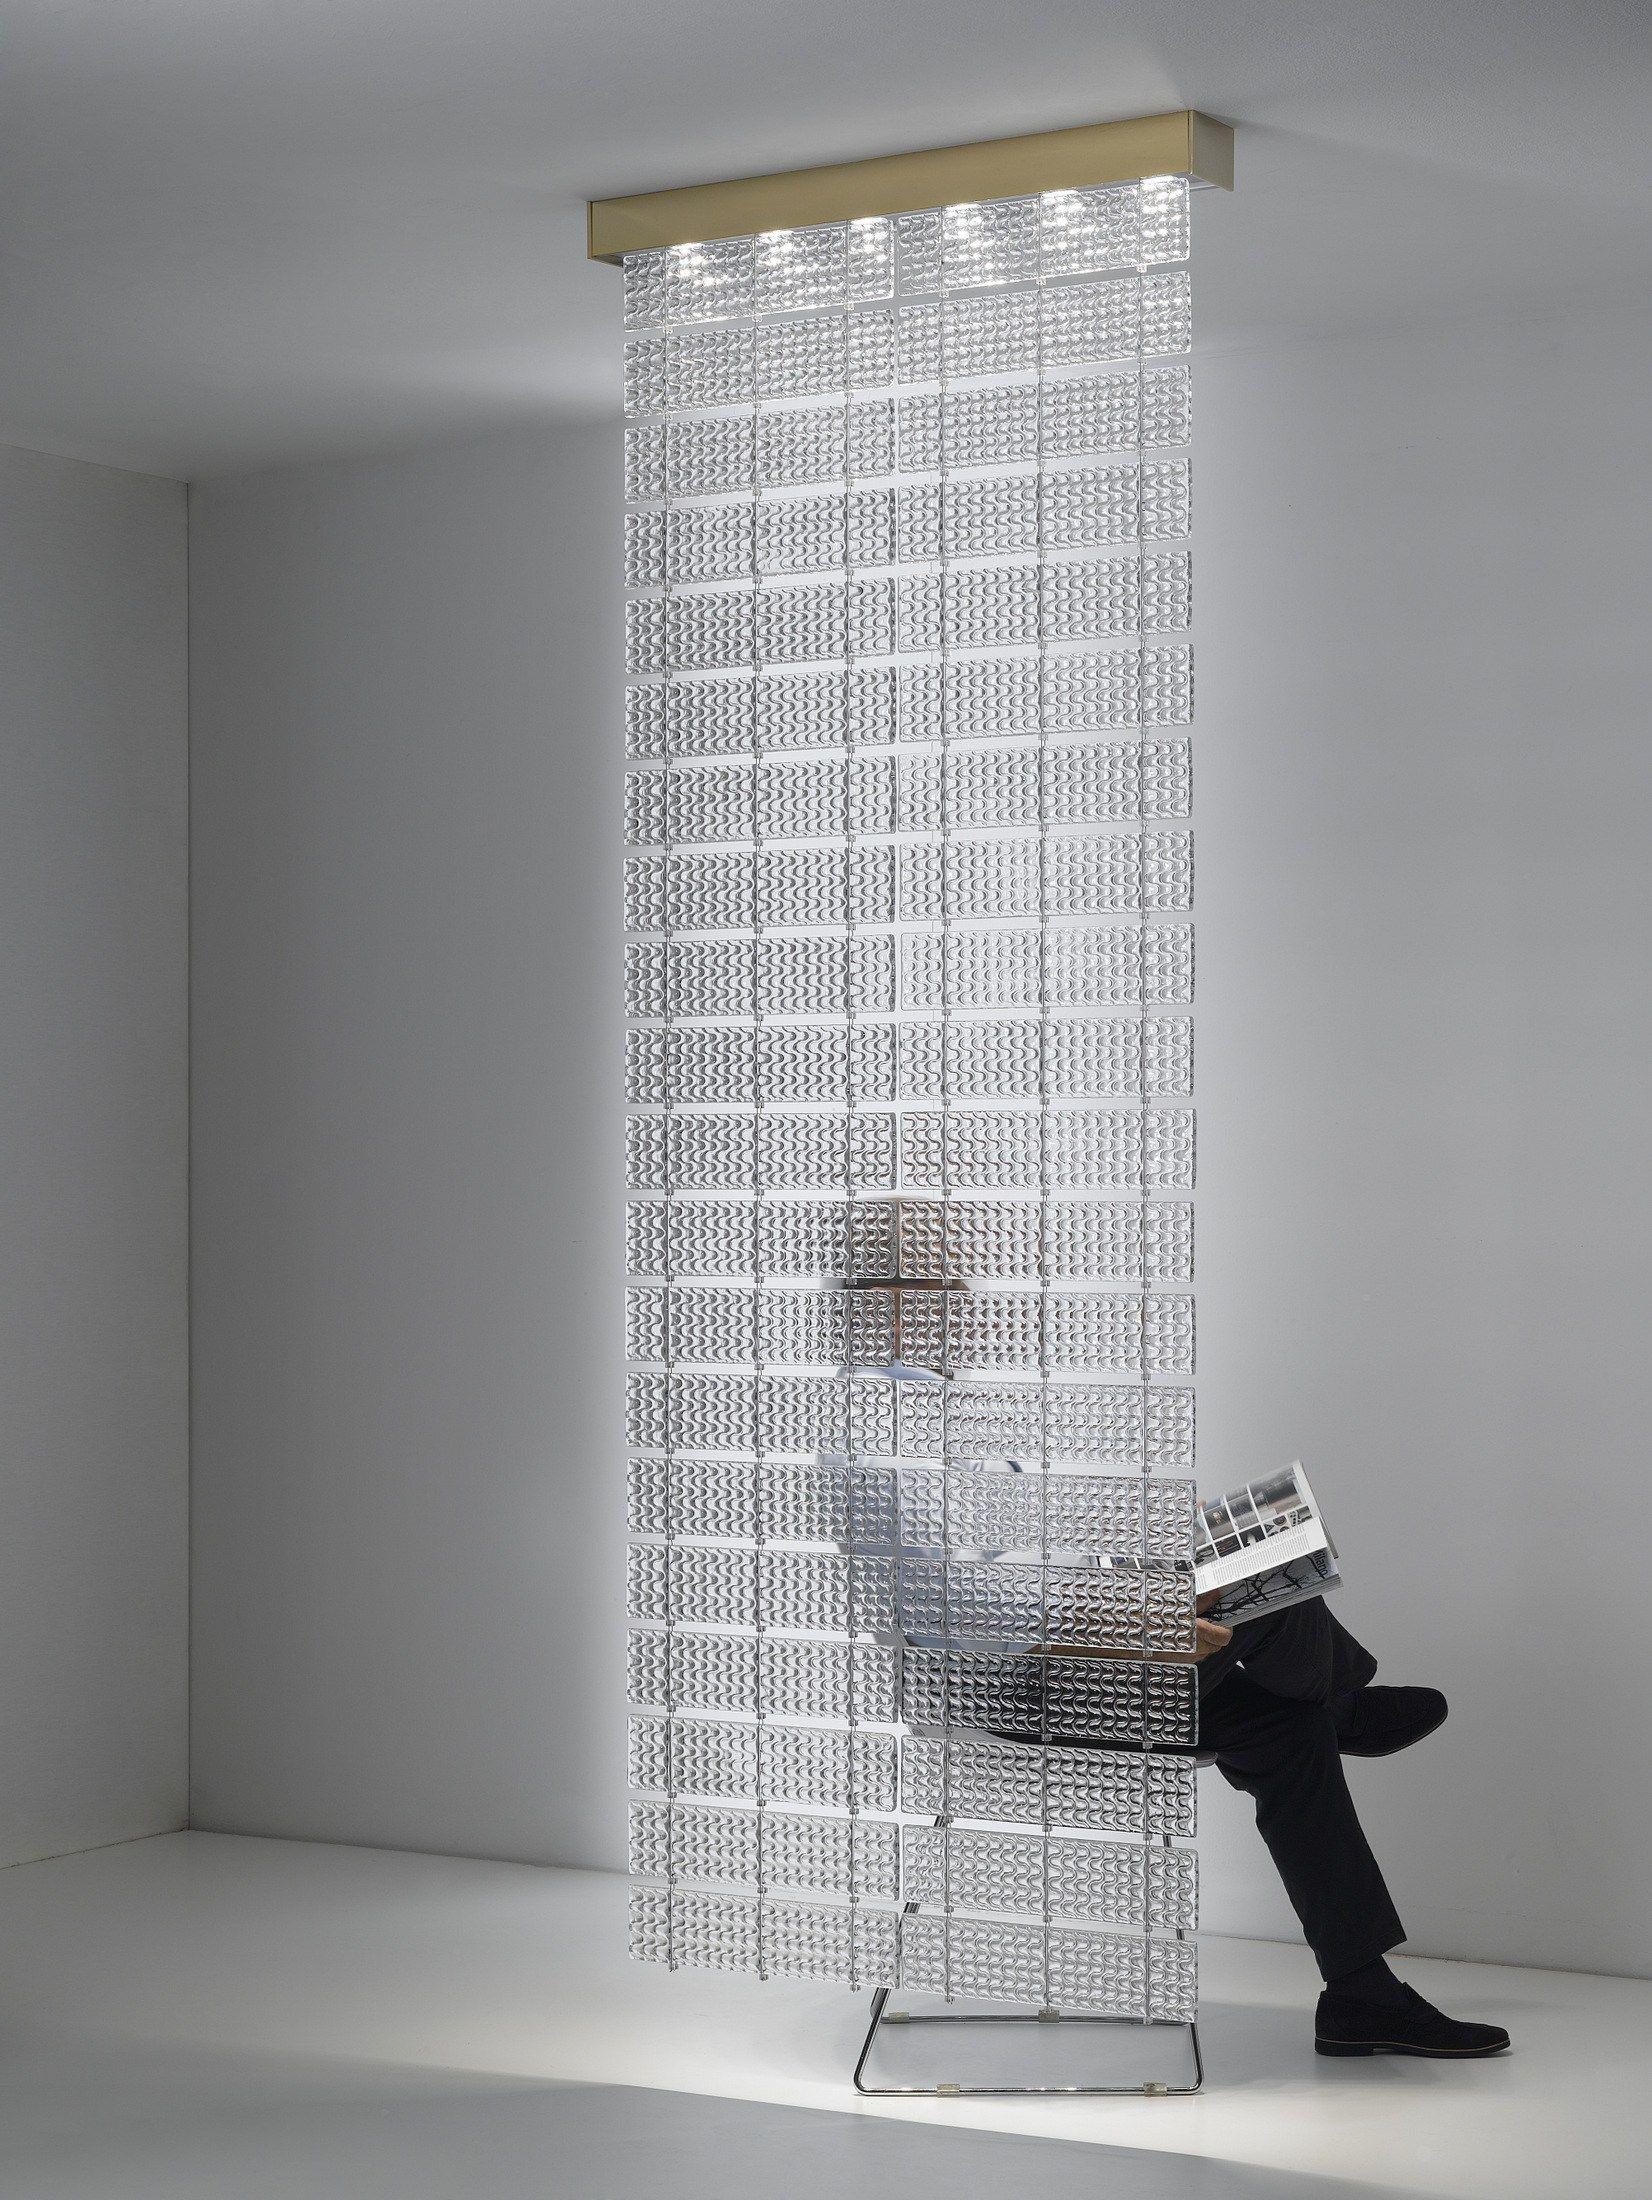 raumteiler aus glas laminis by fabbian design fe design. Black Bedroom Furniture Sets. Home Design Ideas